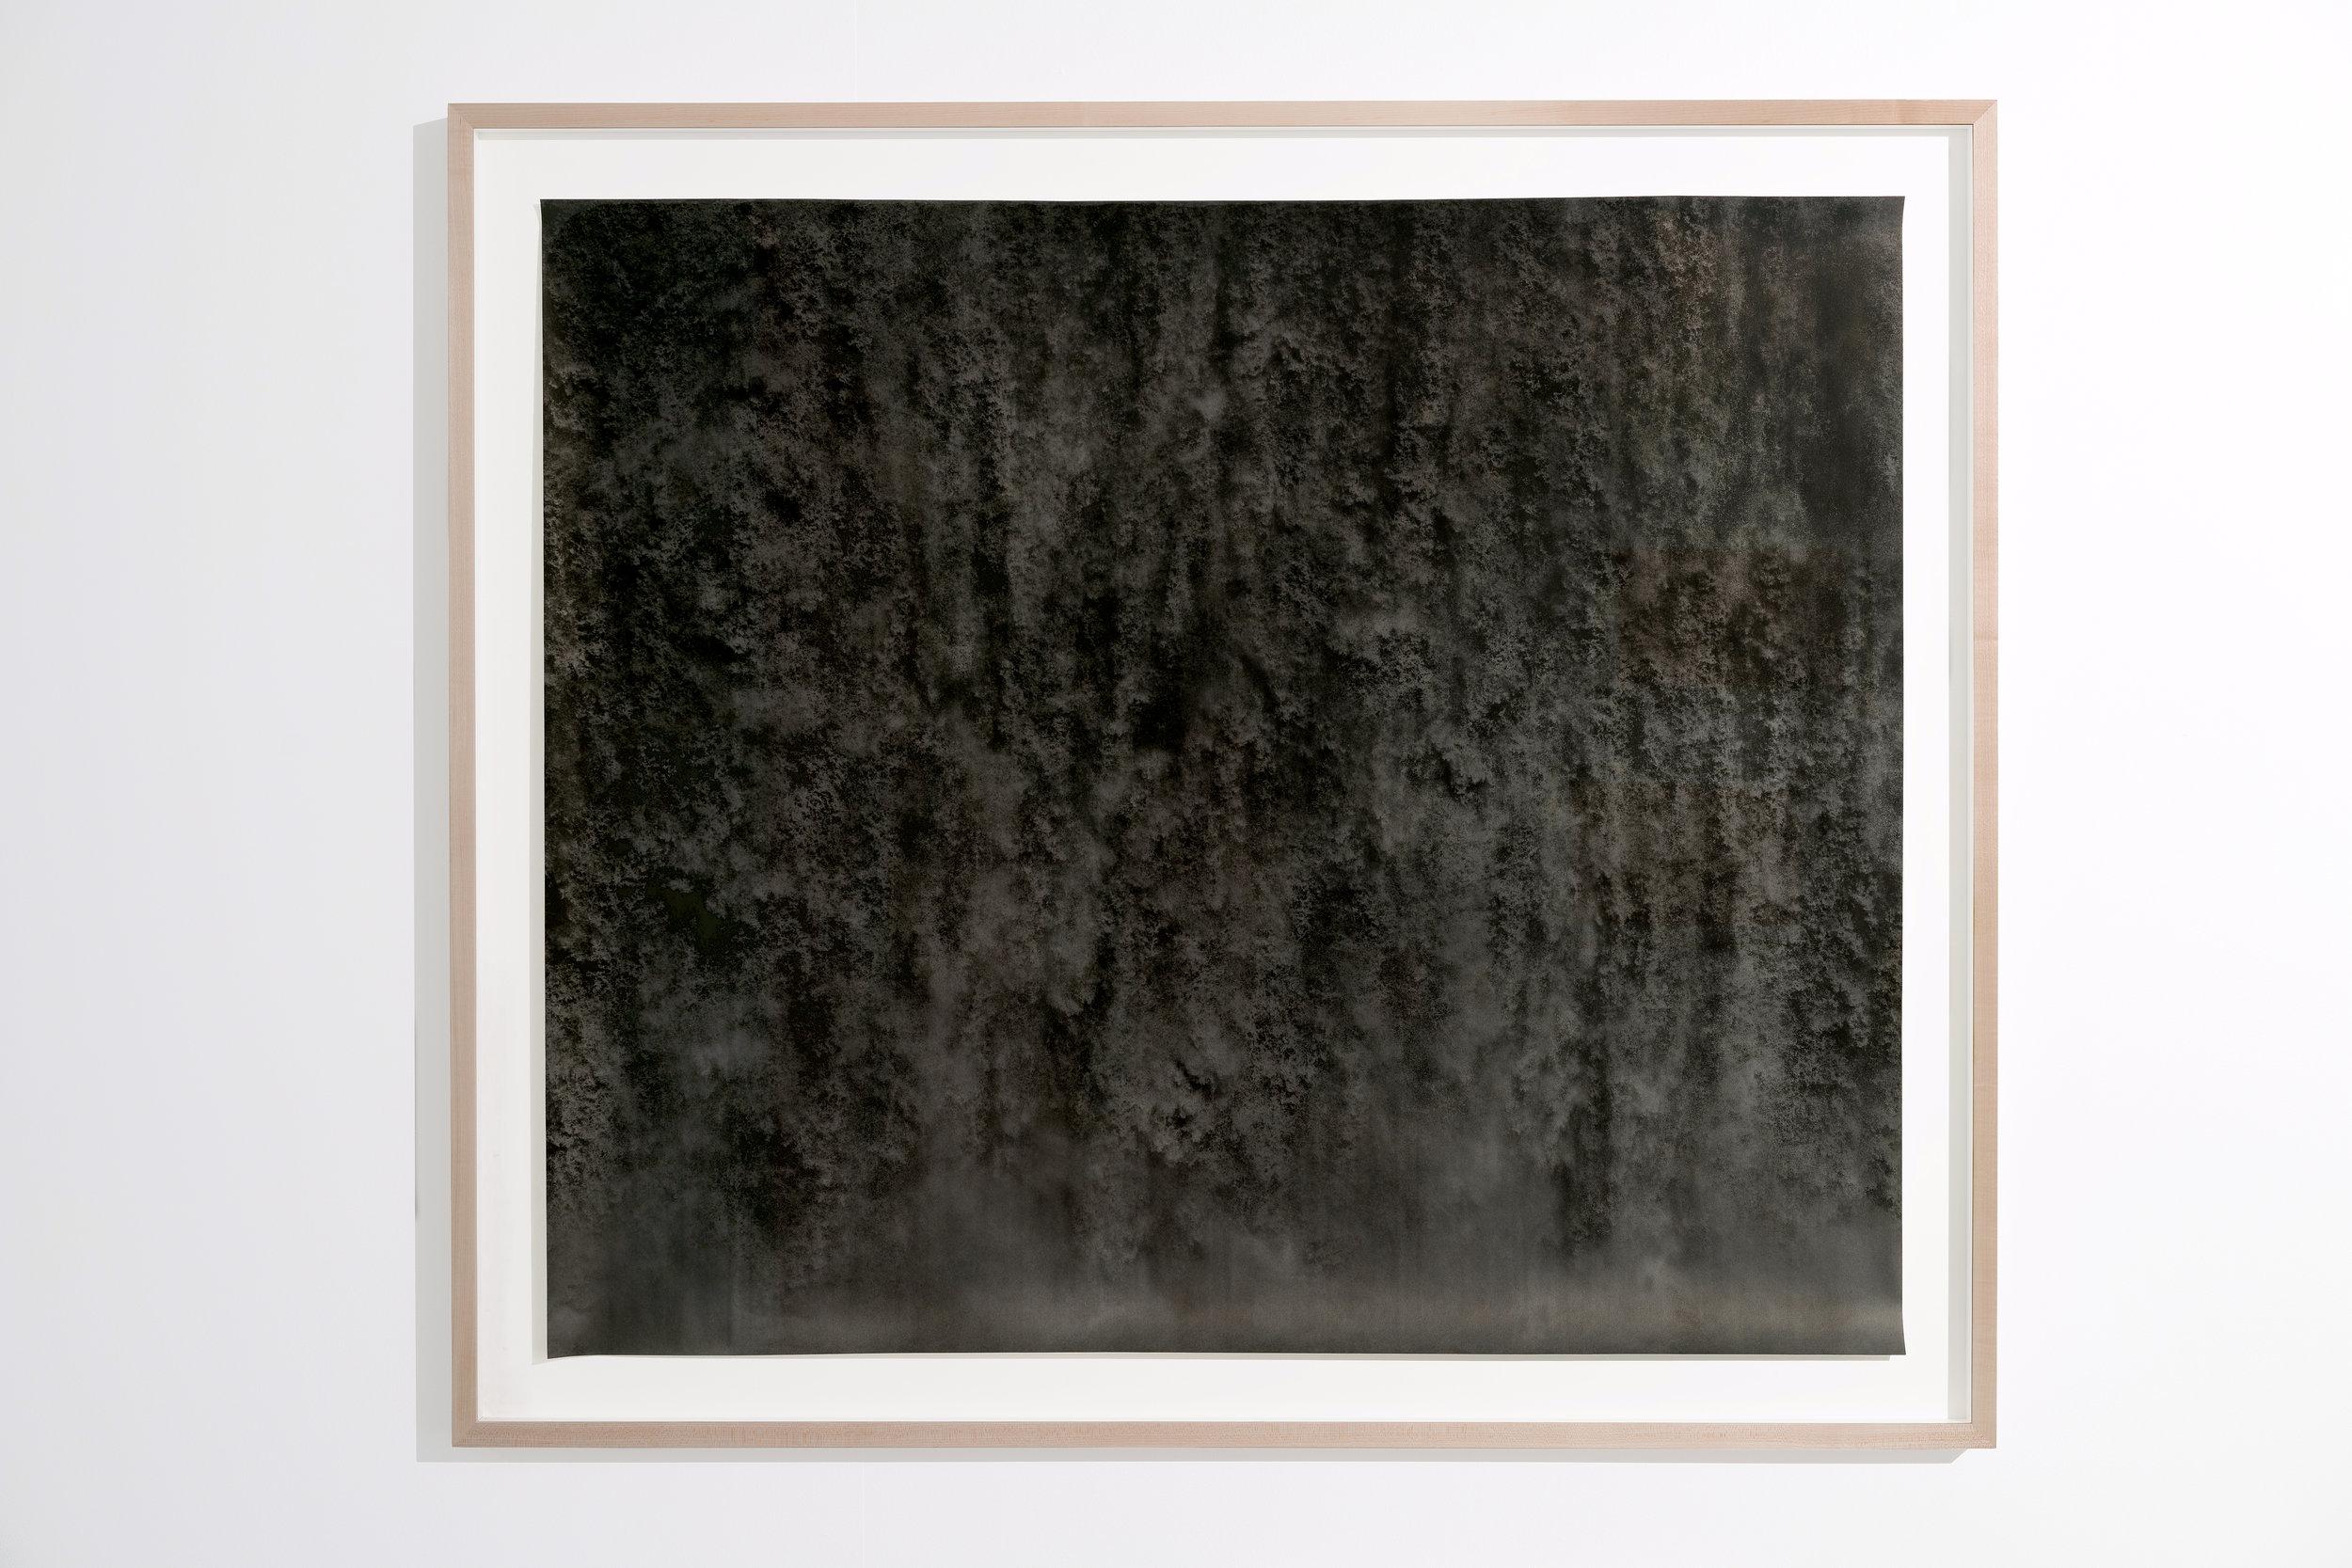 mur2-01.jpg